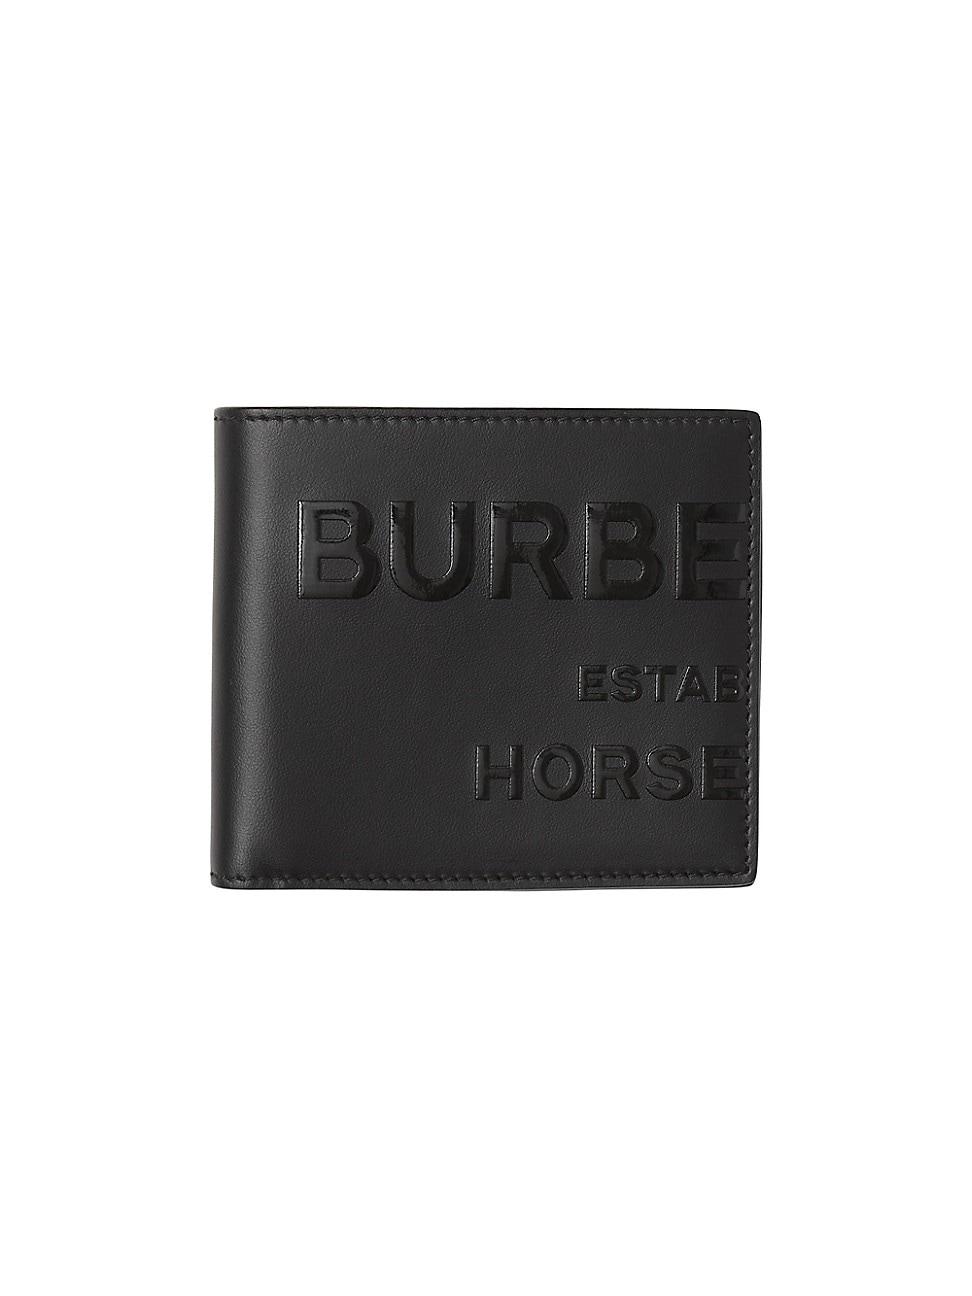 Burberry MEN'S HORSEFERRY PRINT LEATHER INTERNATIONAL BI-FOLD WALLET